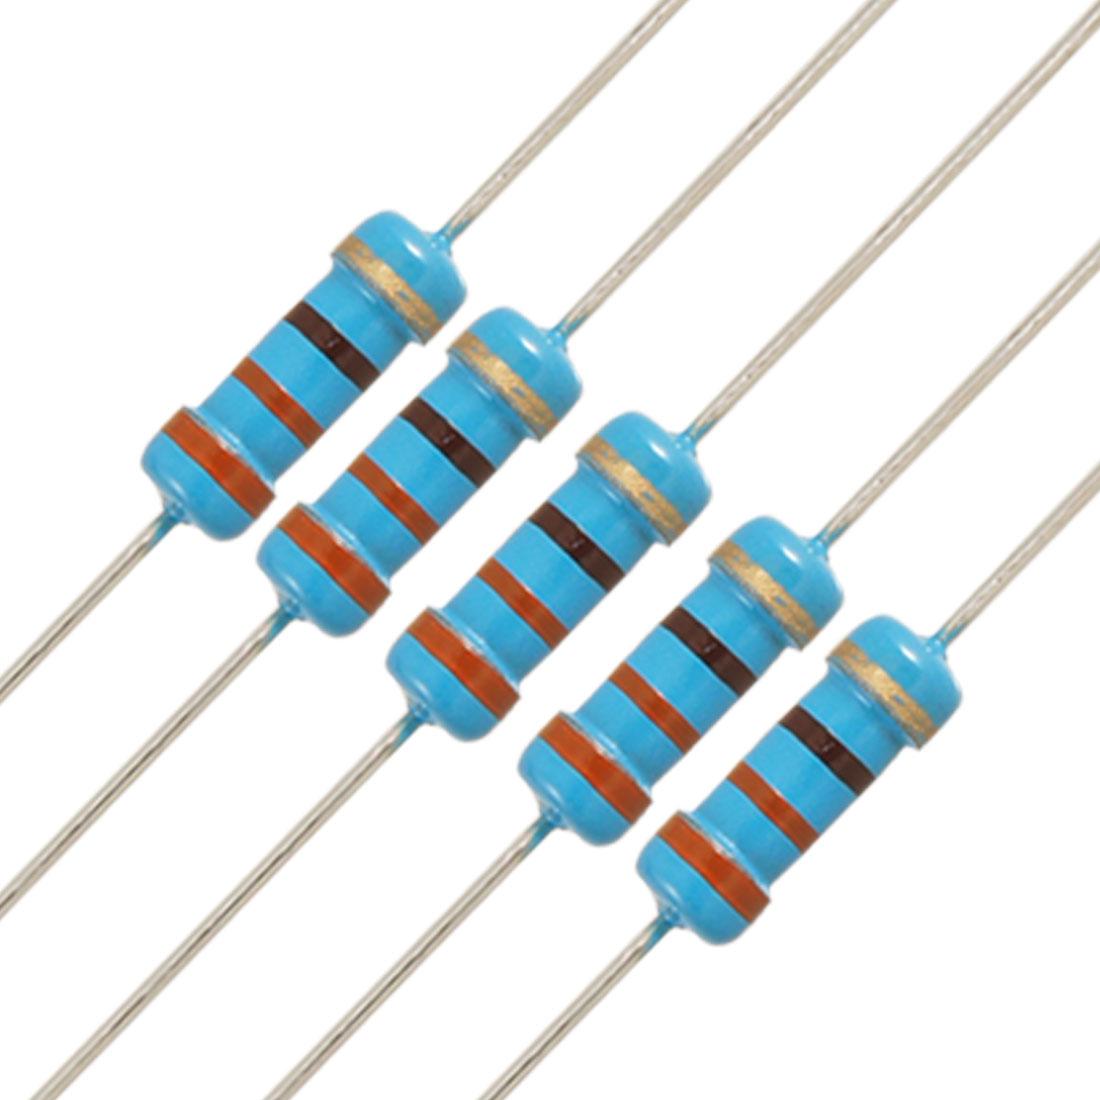 100 Kilo Ohm Resistor Color Code 28 Images Measuring Resistance Of Resistors Using A